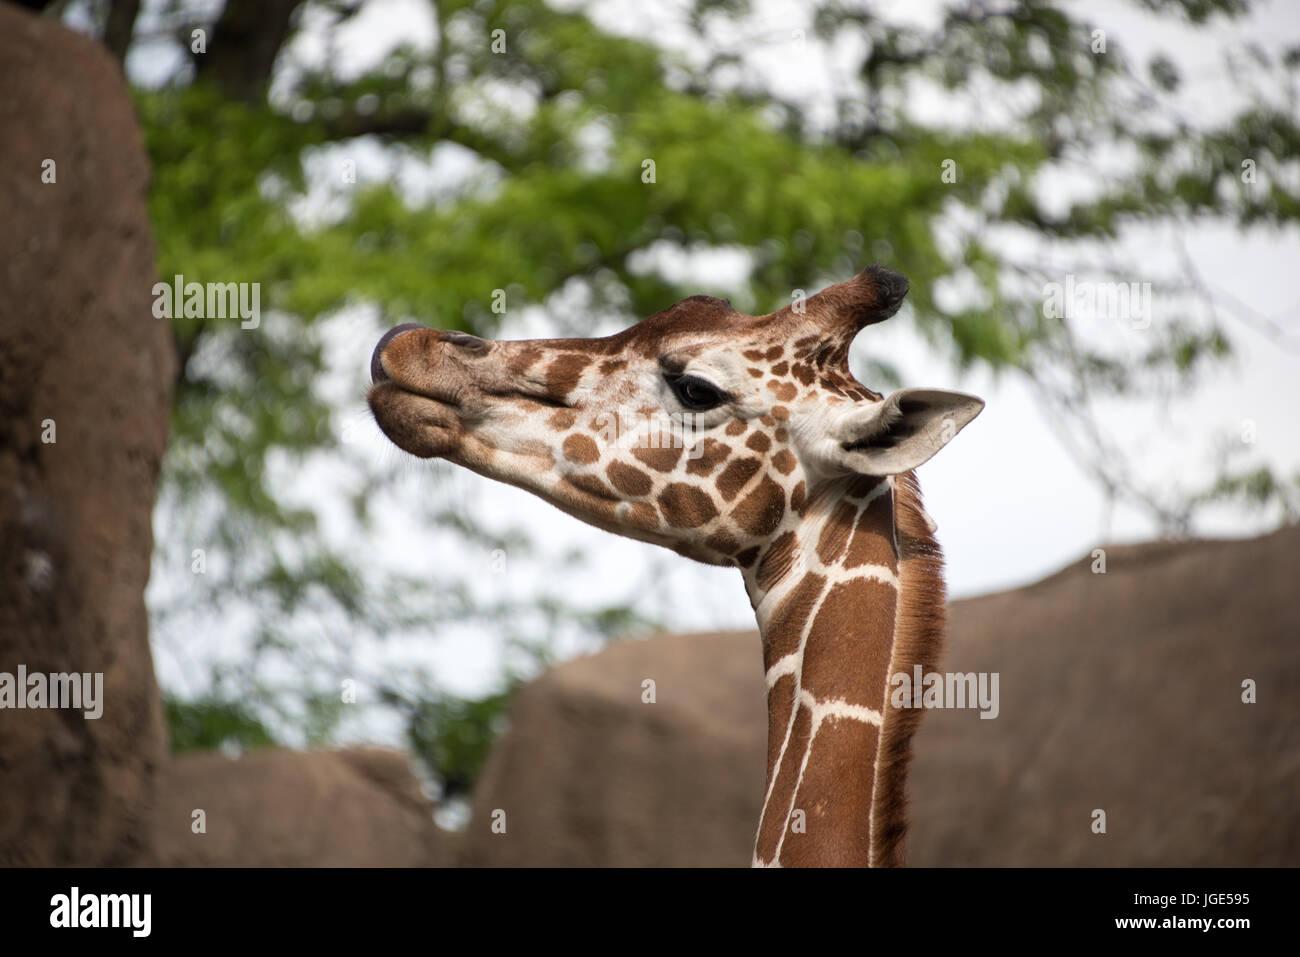 Giraffes Okapis Giraffidae Stock Photos Giraffes Okapis Giraffidae